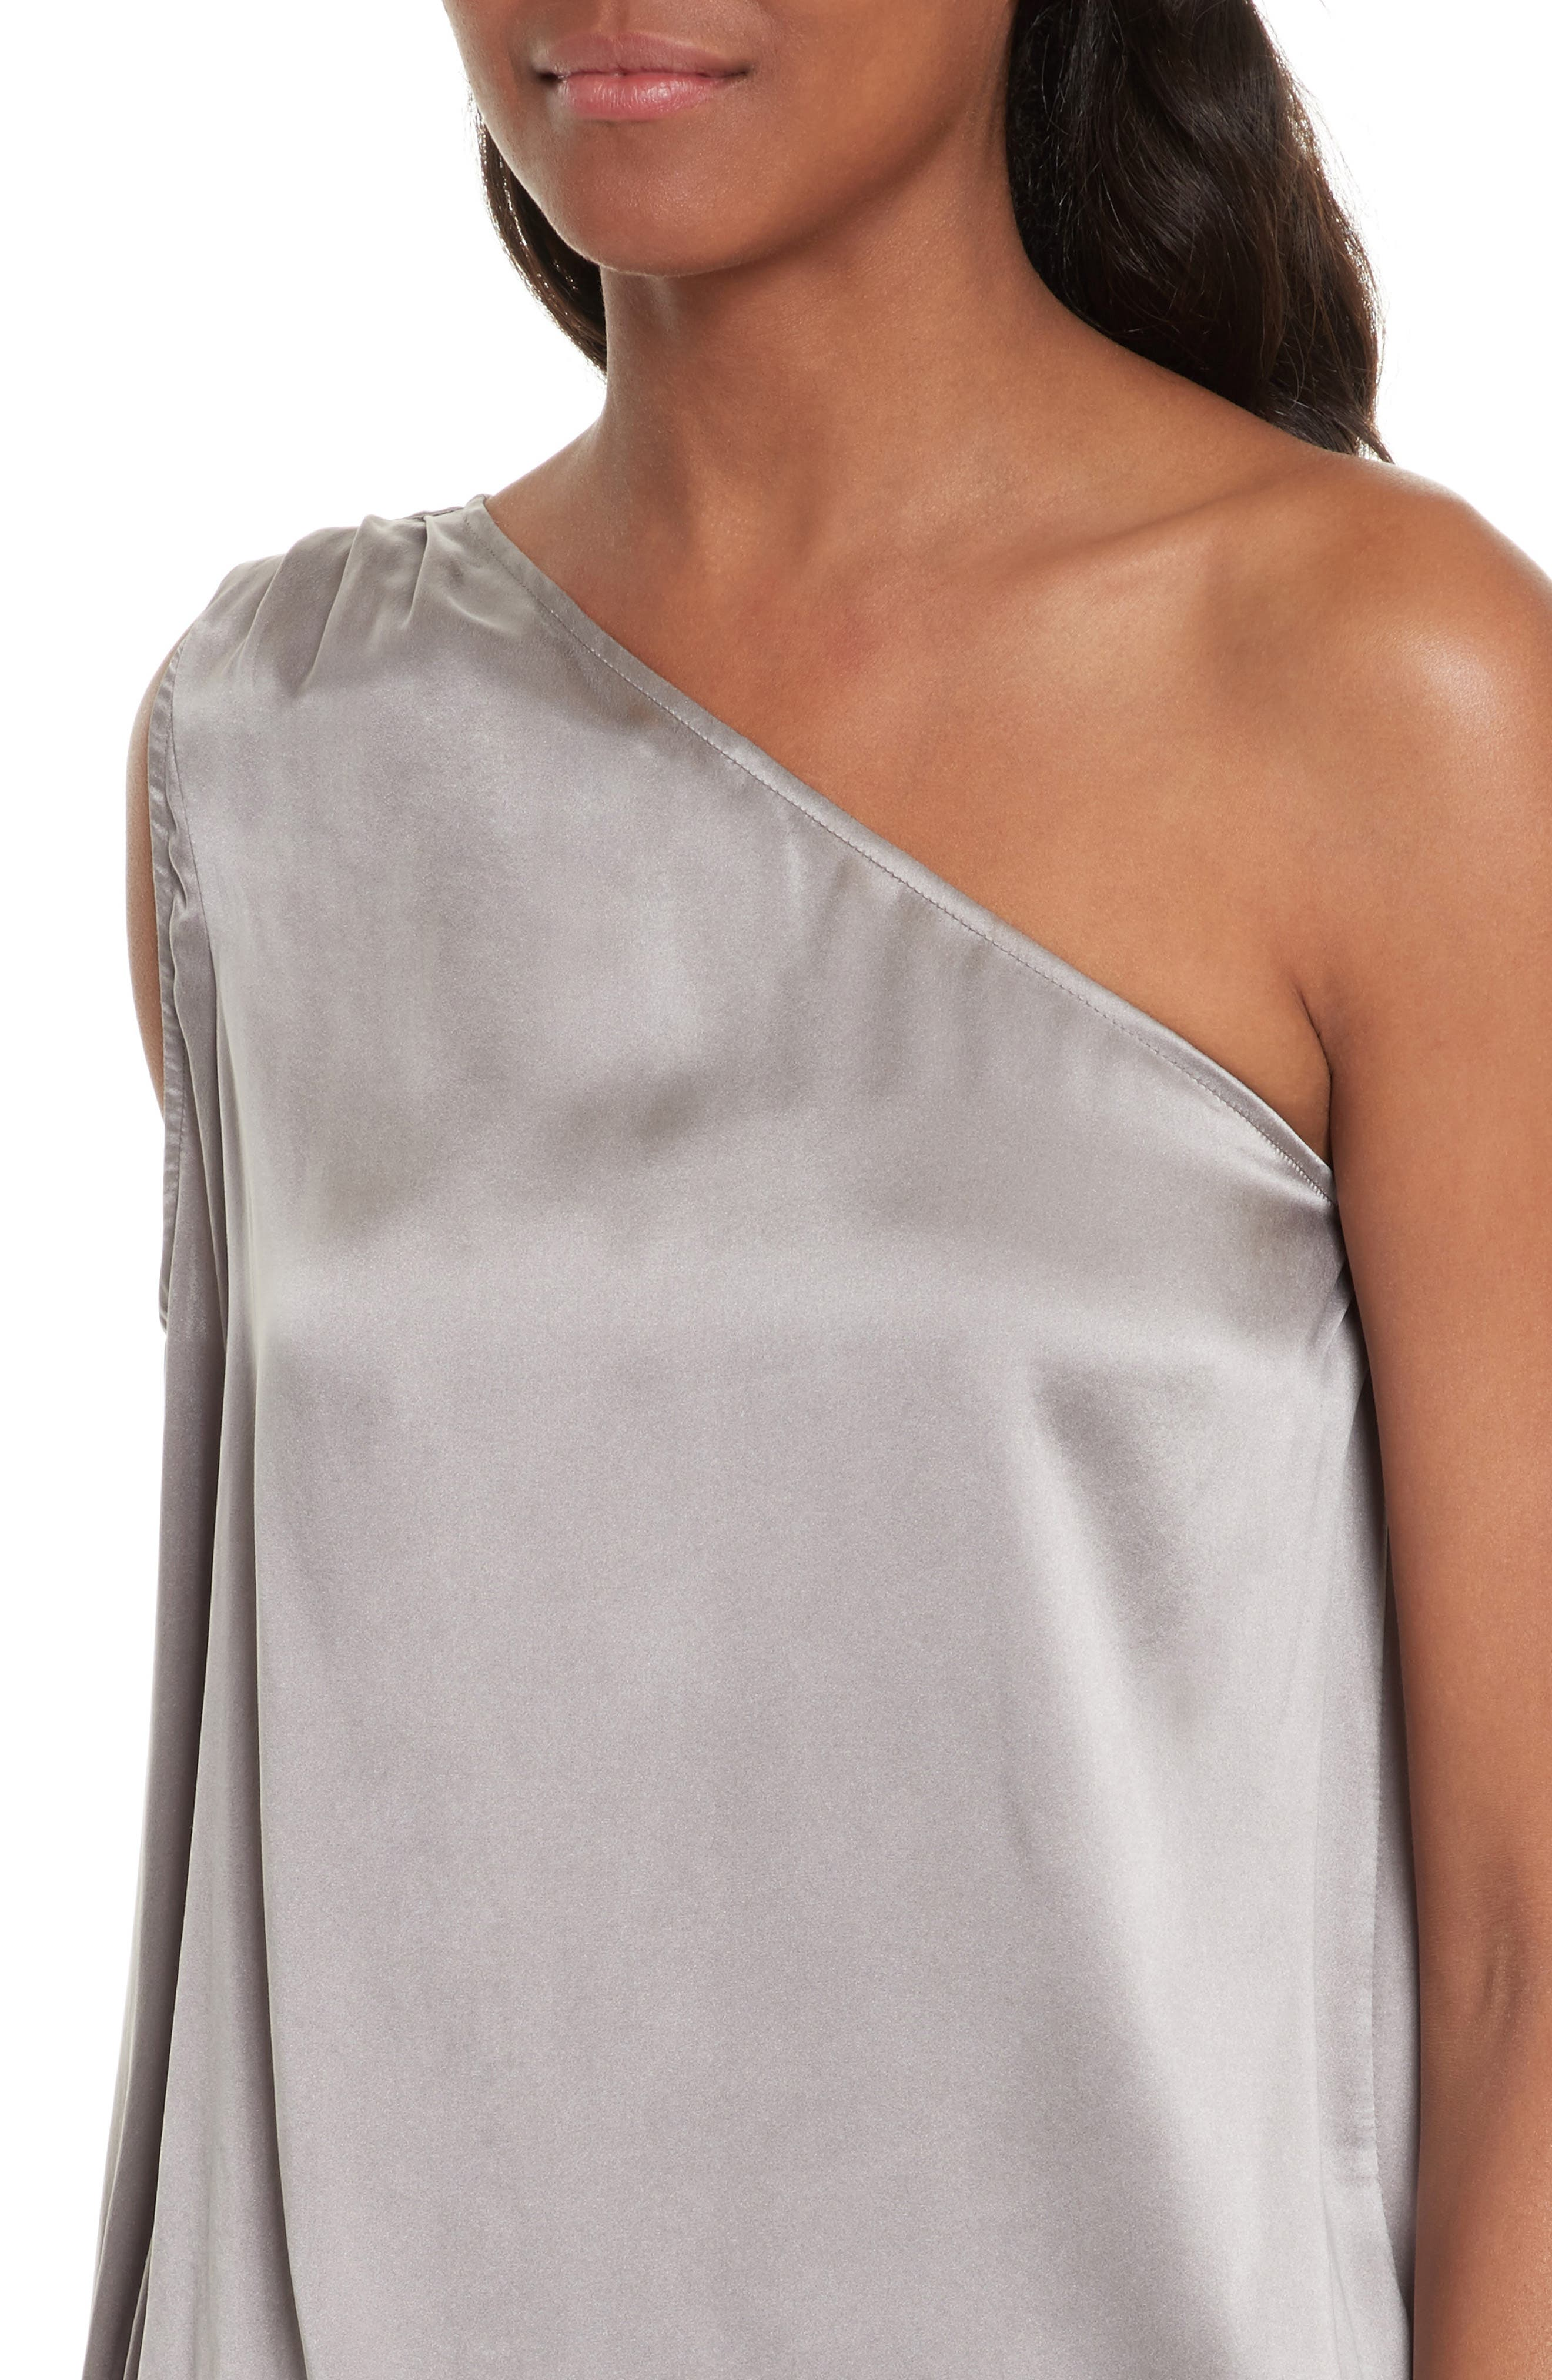 Abatha One-Shoulder Silk Top,                             Alternate thumbnail 4, color,